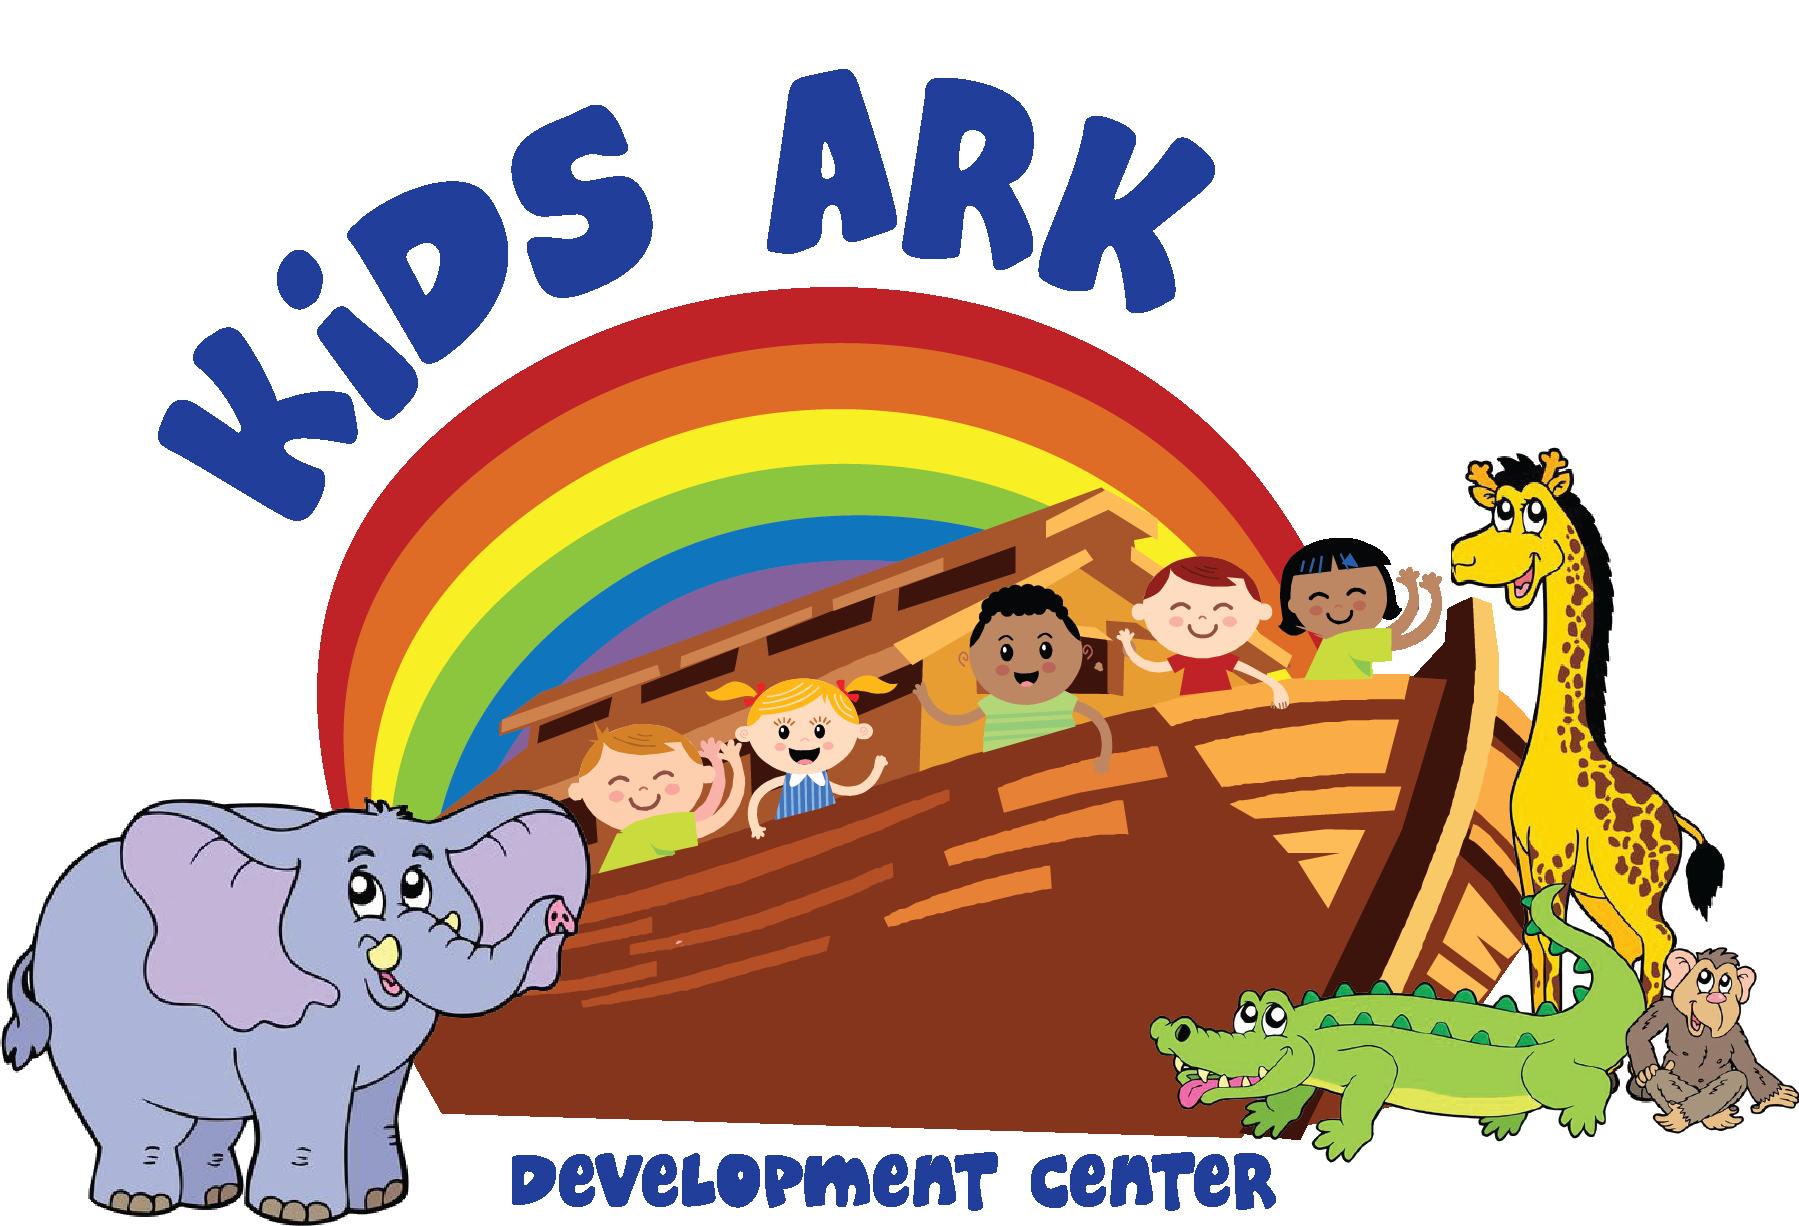 Curriculum clipart cognitive development. Kids ark child care